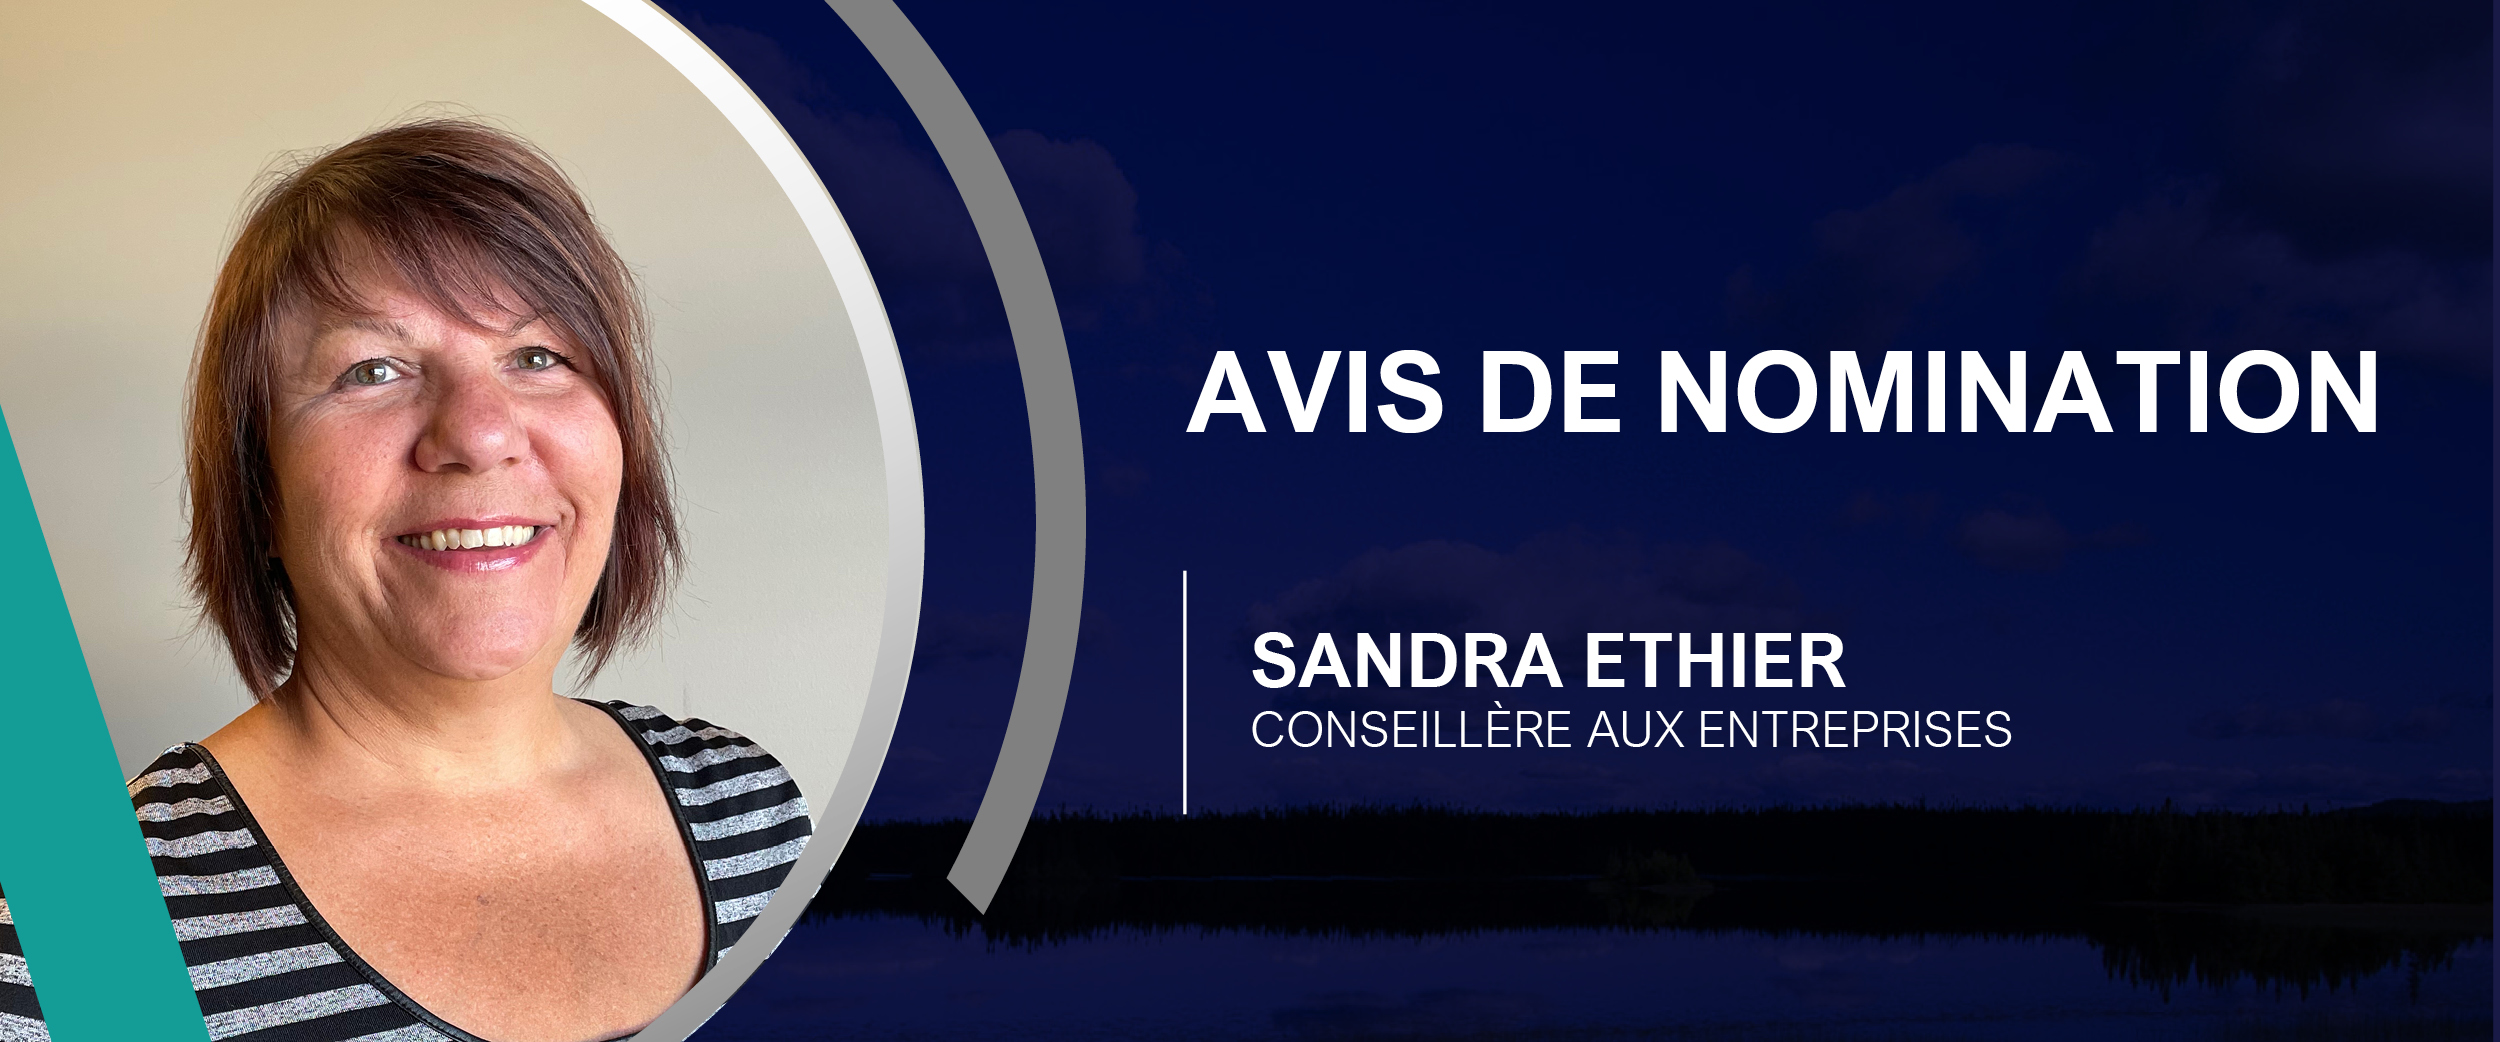 Avis de nomination Sandra Ethier